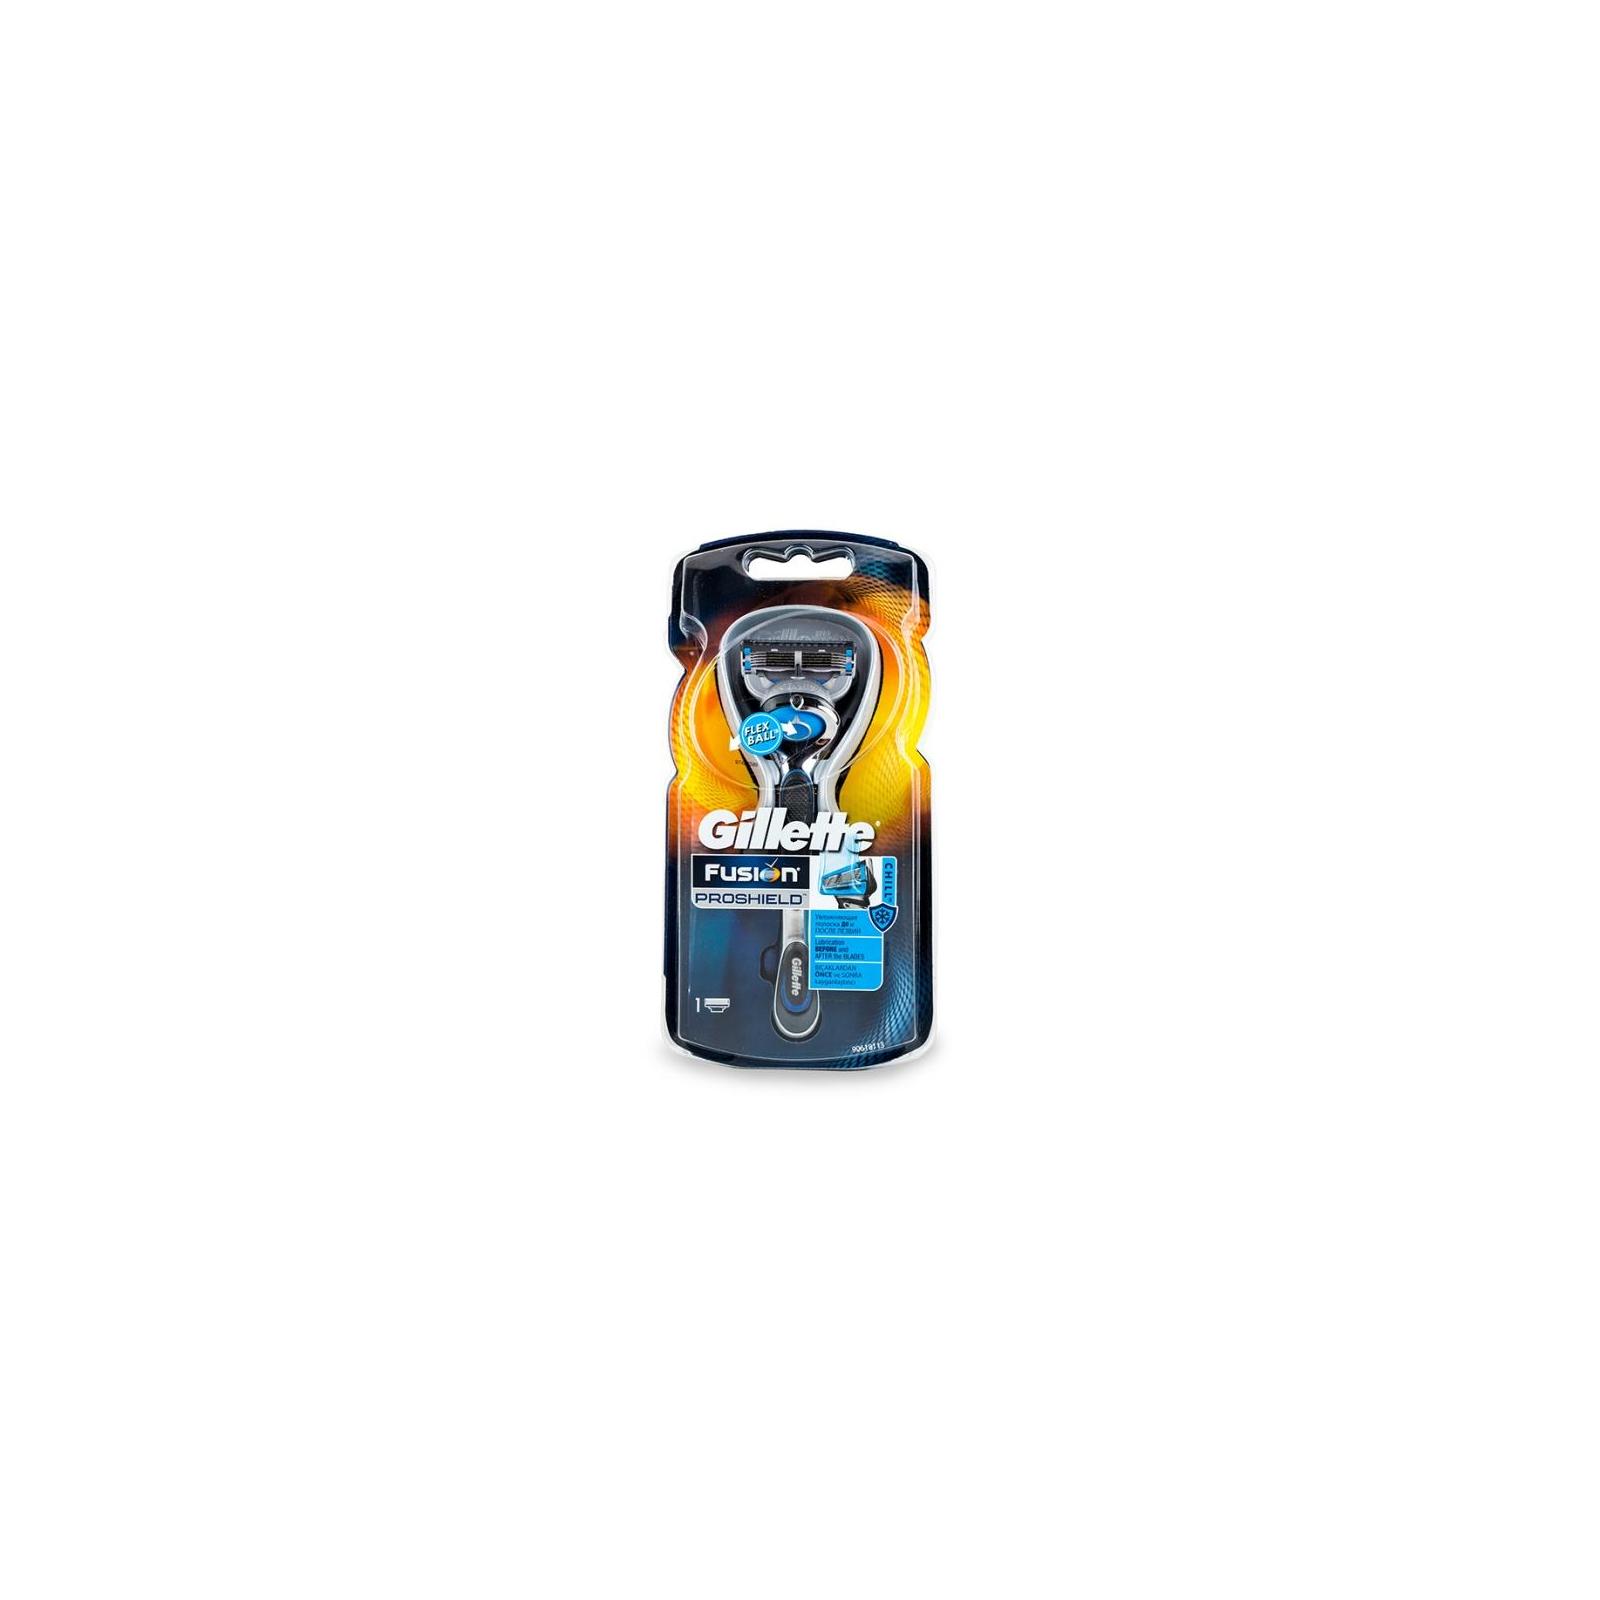 Бритва Gillette Fusion ProShield Chill с технологией FlexBall (7702018412846)